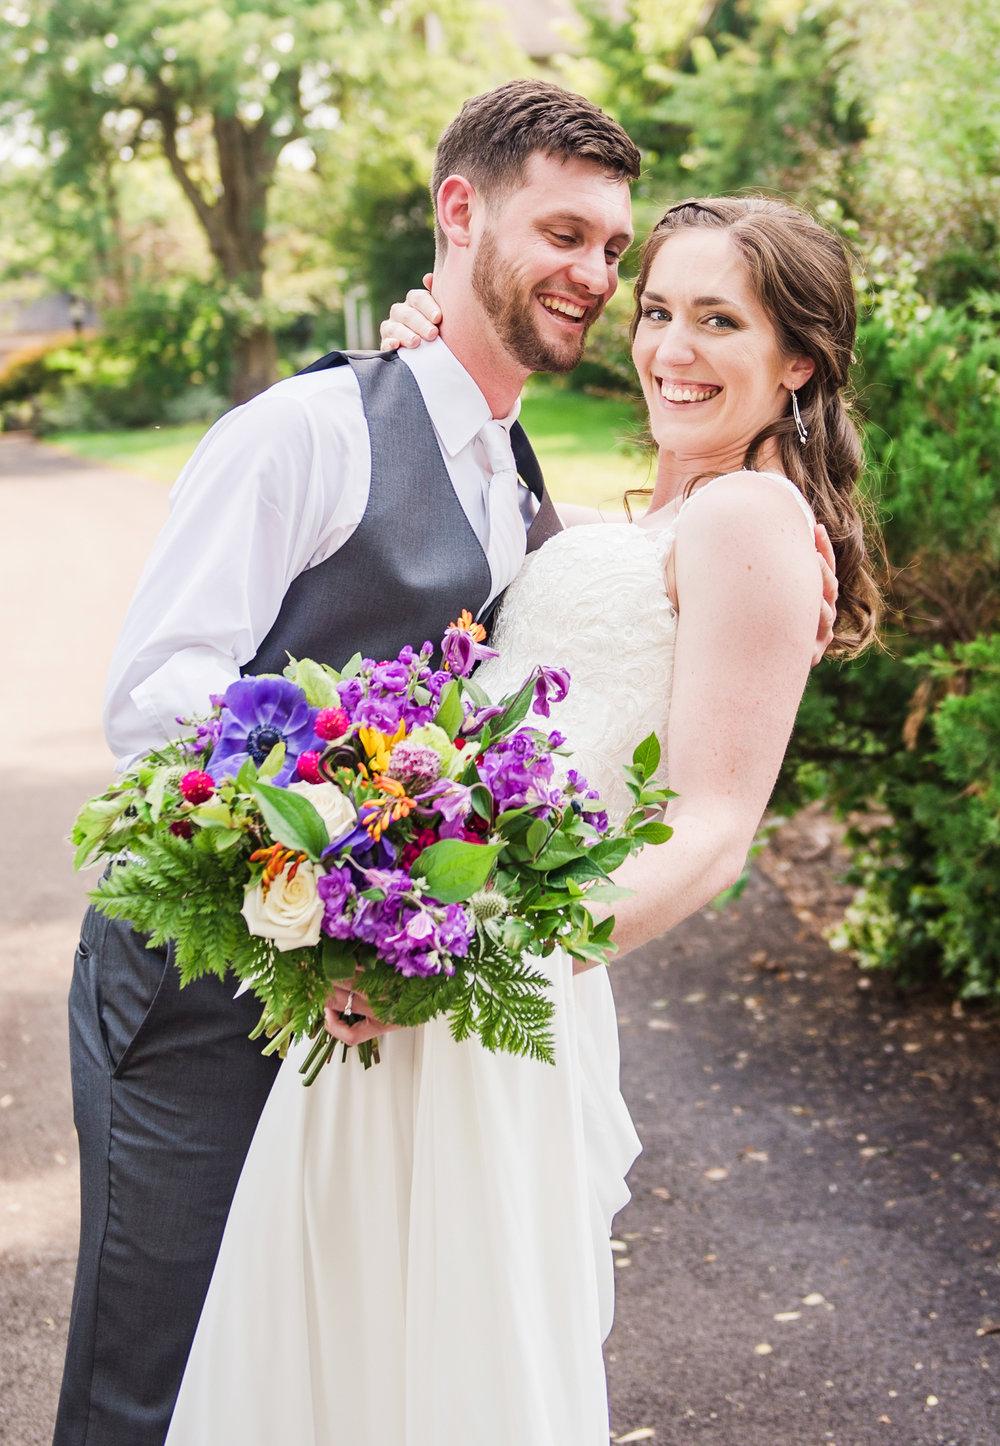 Jerris_Wadsworth_Wedding_Barn_Rochester_Wedding_JILL_STUDIO_Rochester_NY_Photographer_DSC_2489.jpg